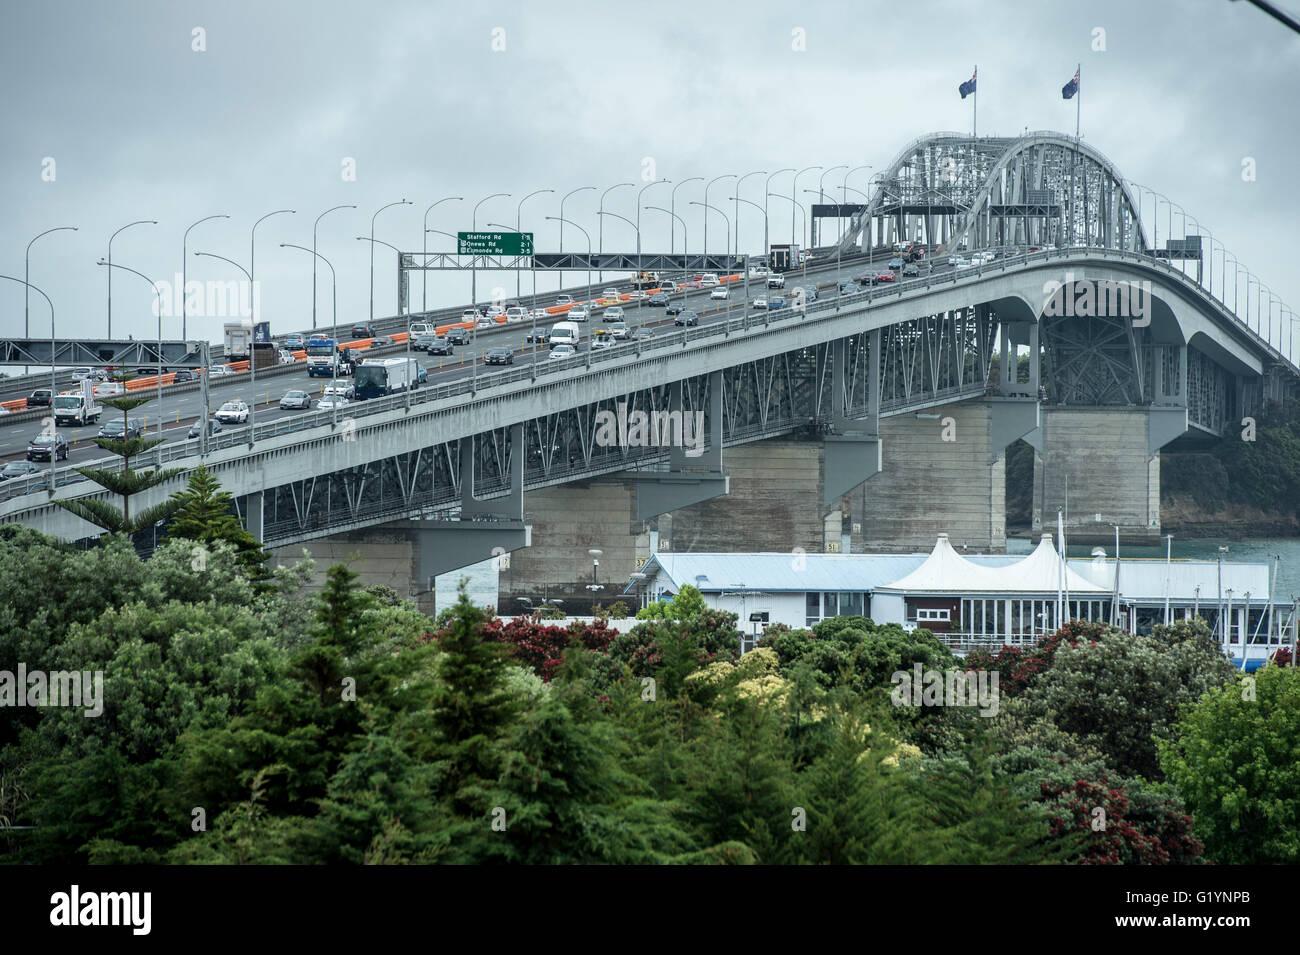 Auckland Harbour Bridge. - Stock Image